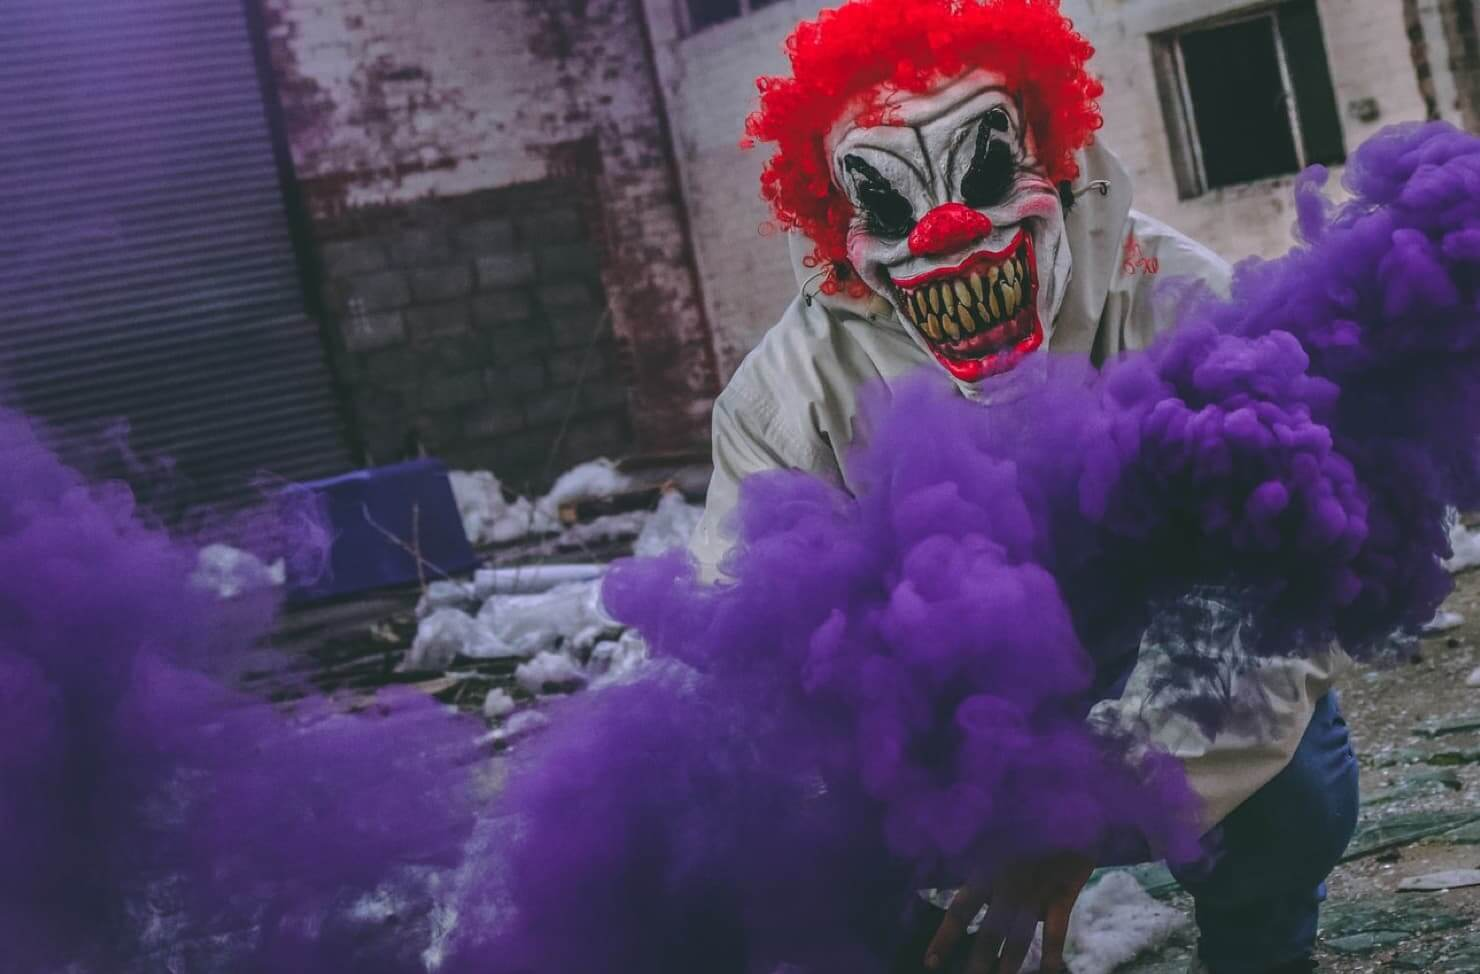 Halloween clown costume